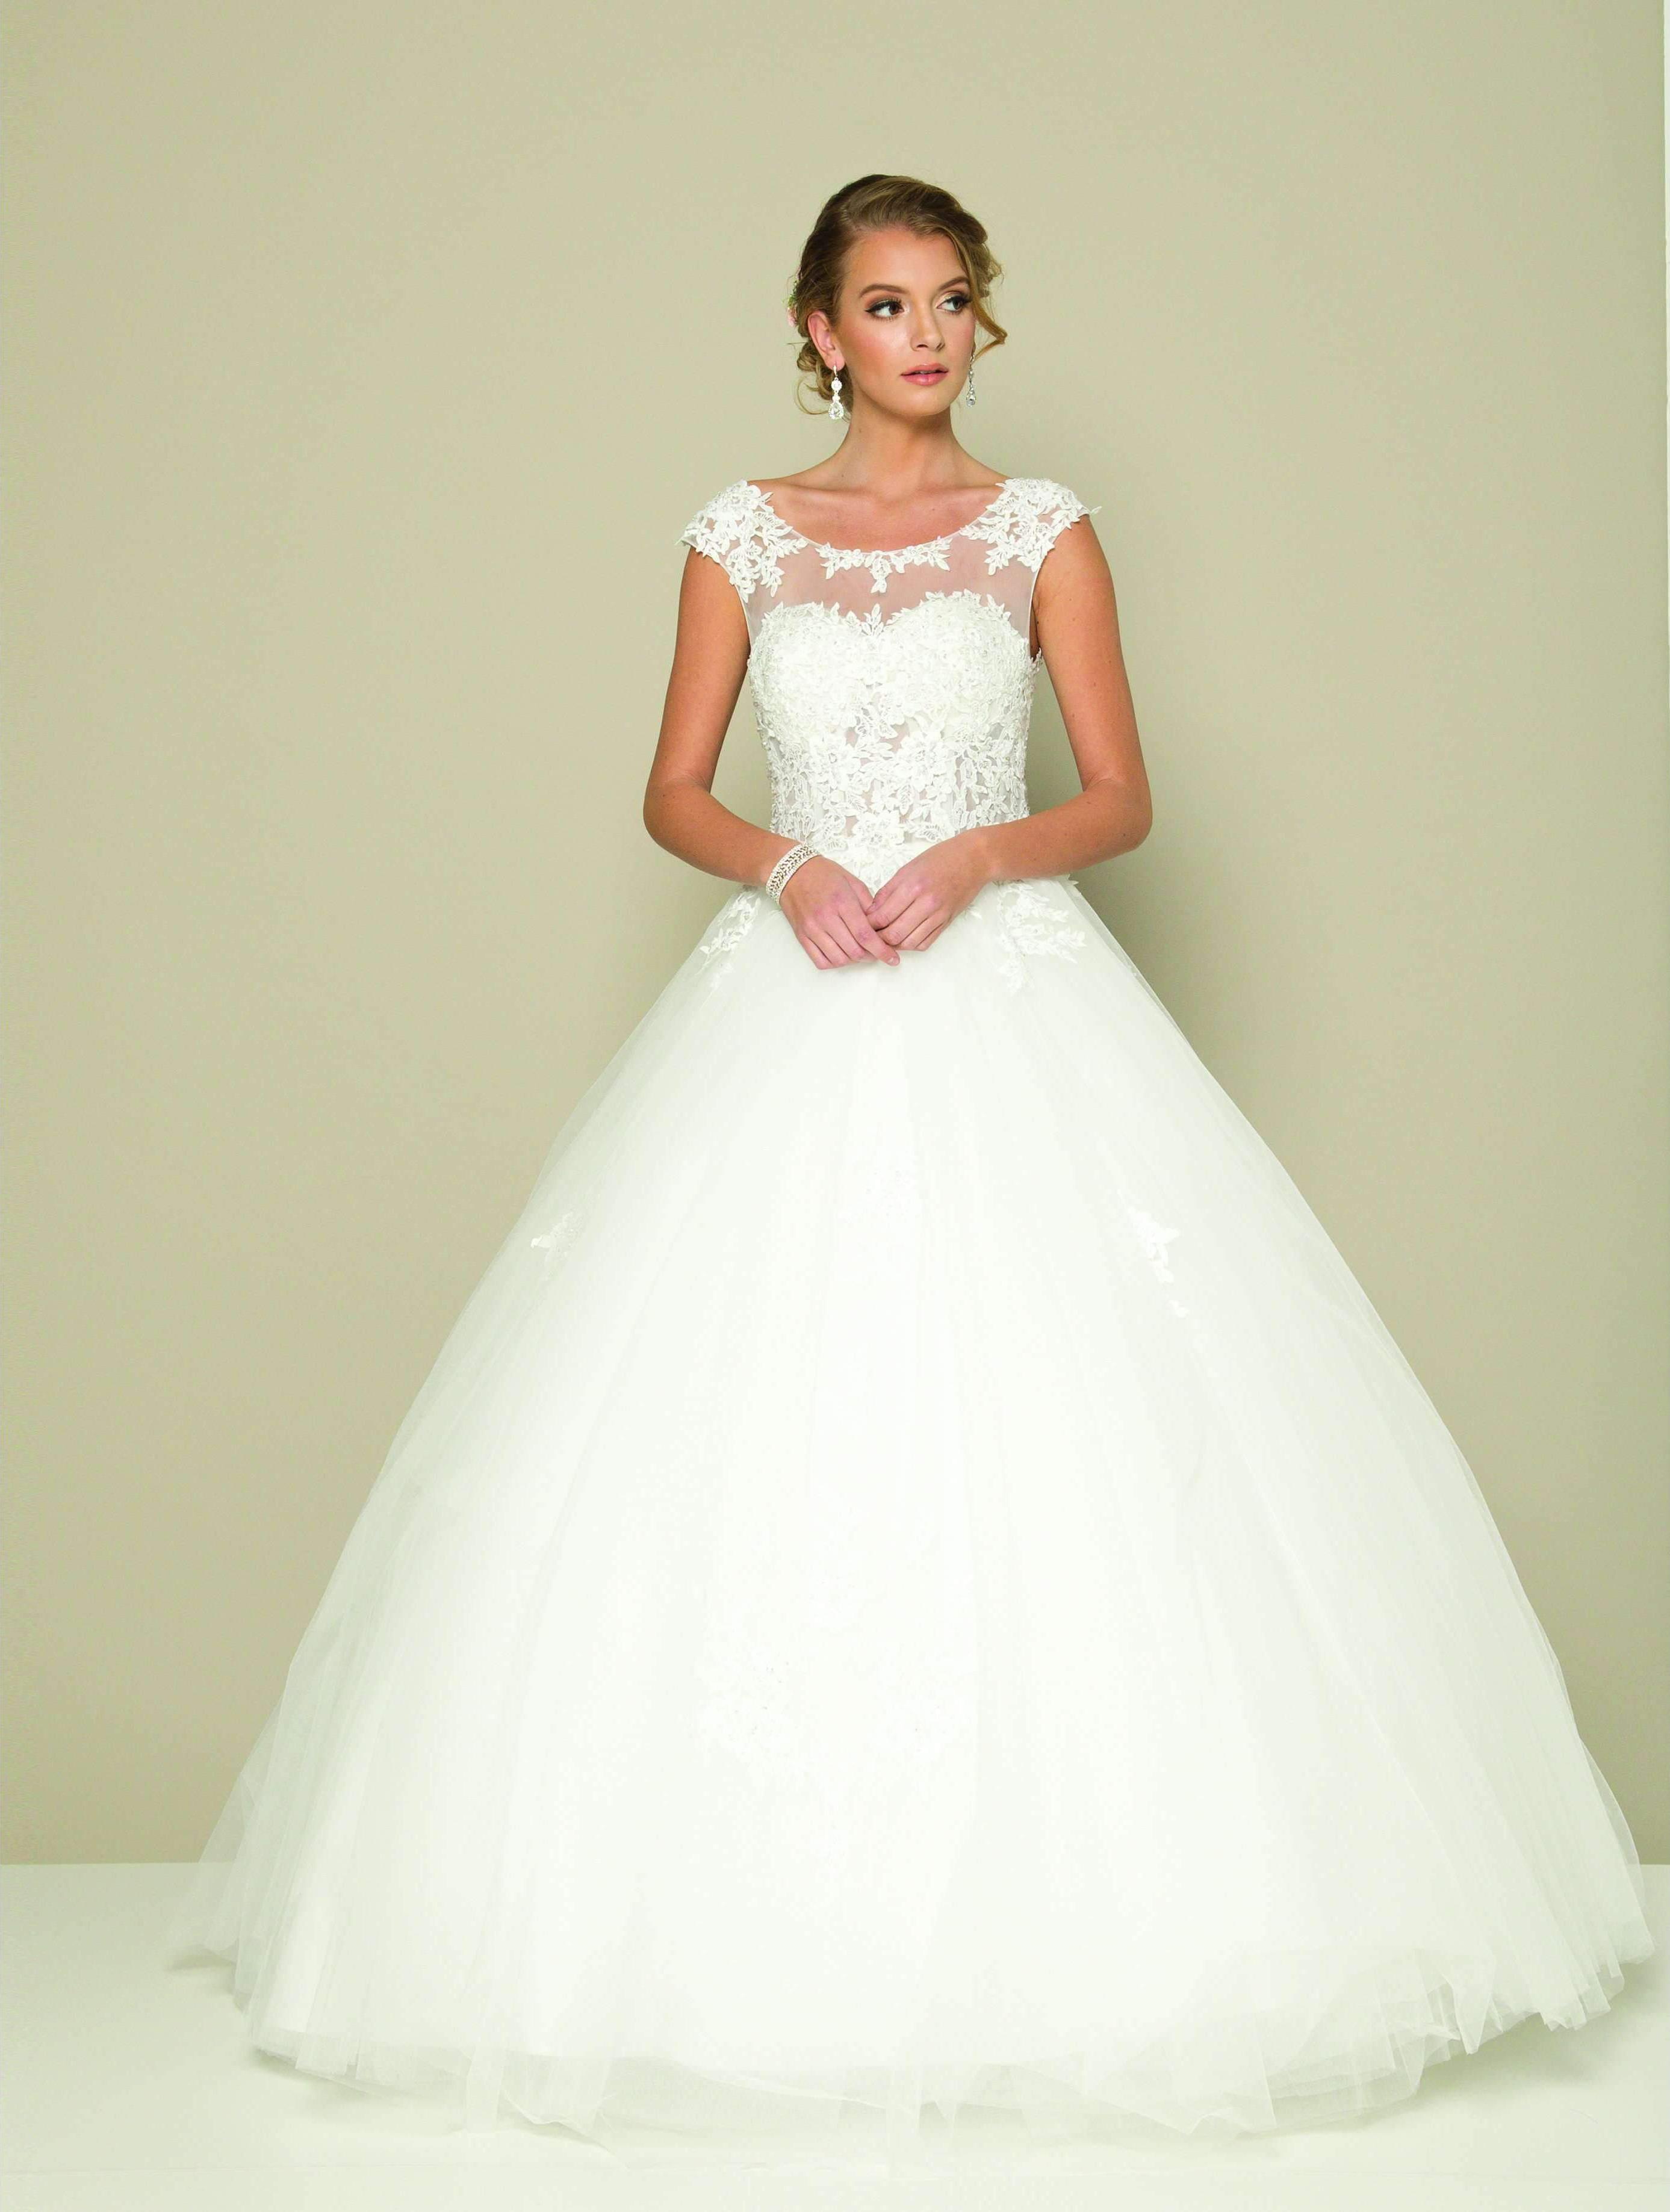 Sarasota-Wedding-dresses-bridal-Barbies-boutique ...